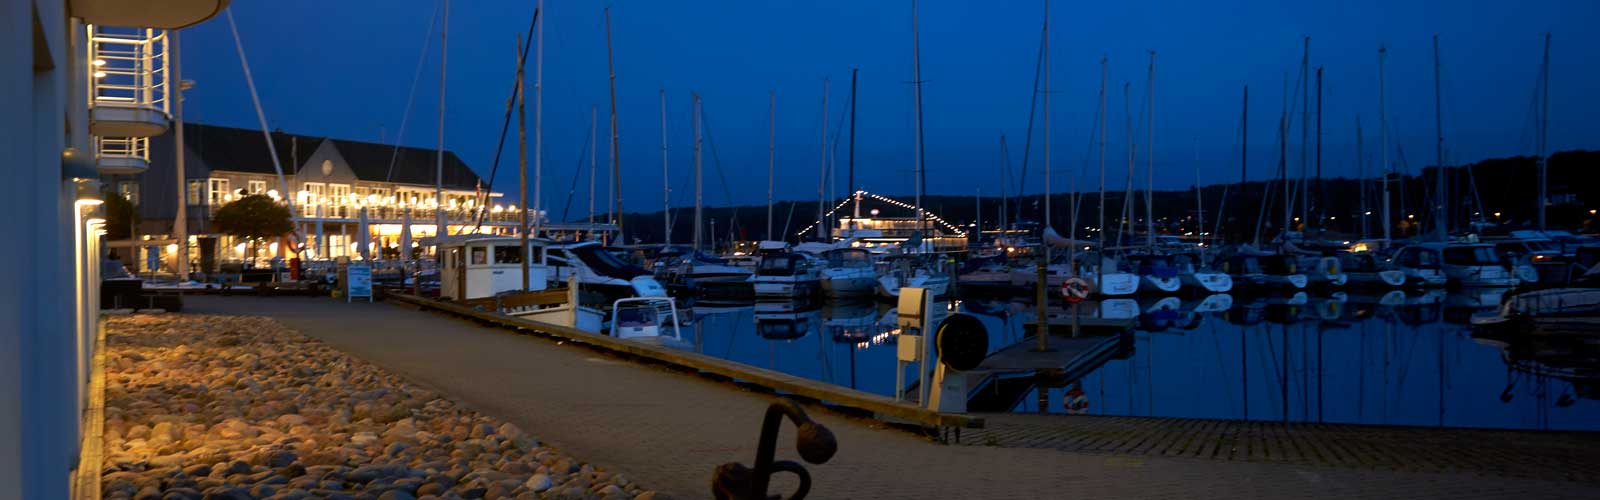 Havnehotellet night